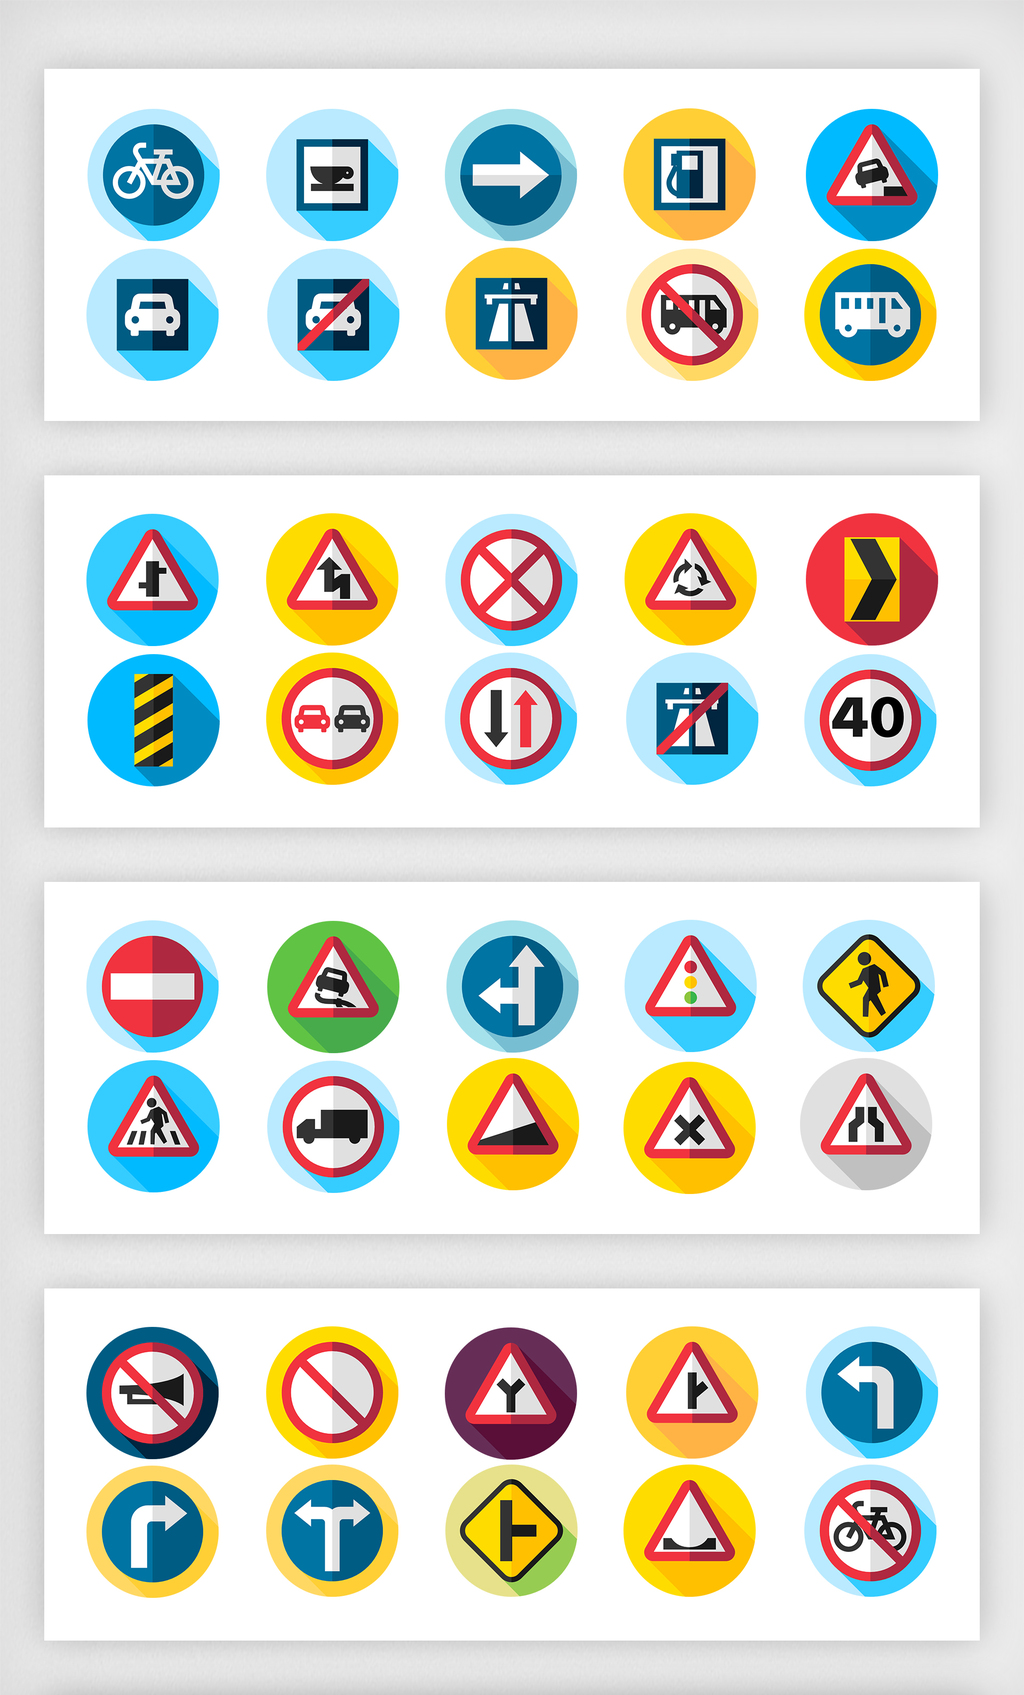 icon                                    图标